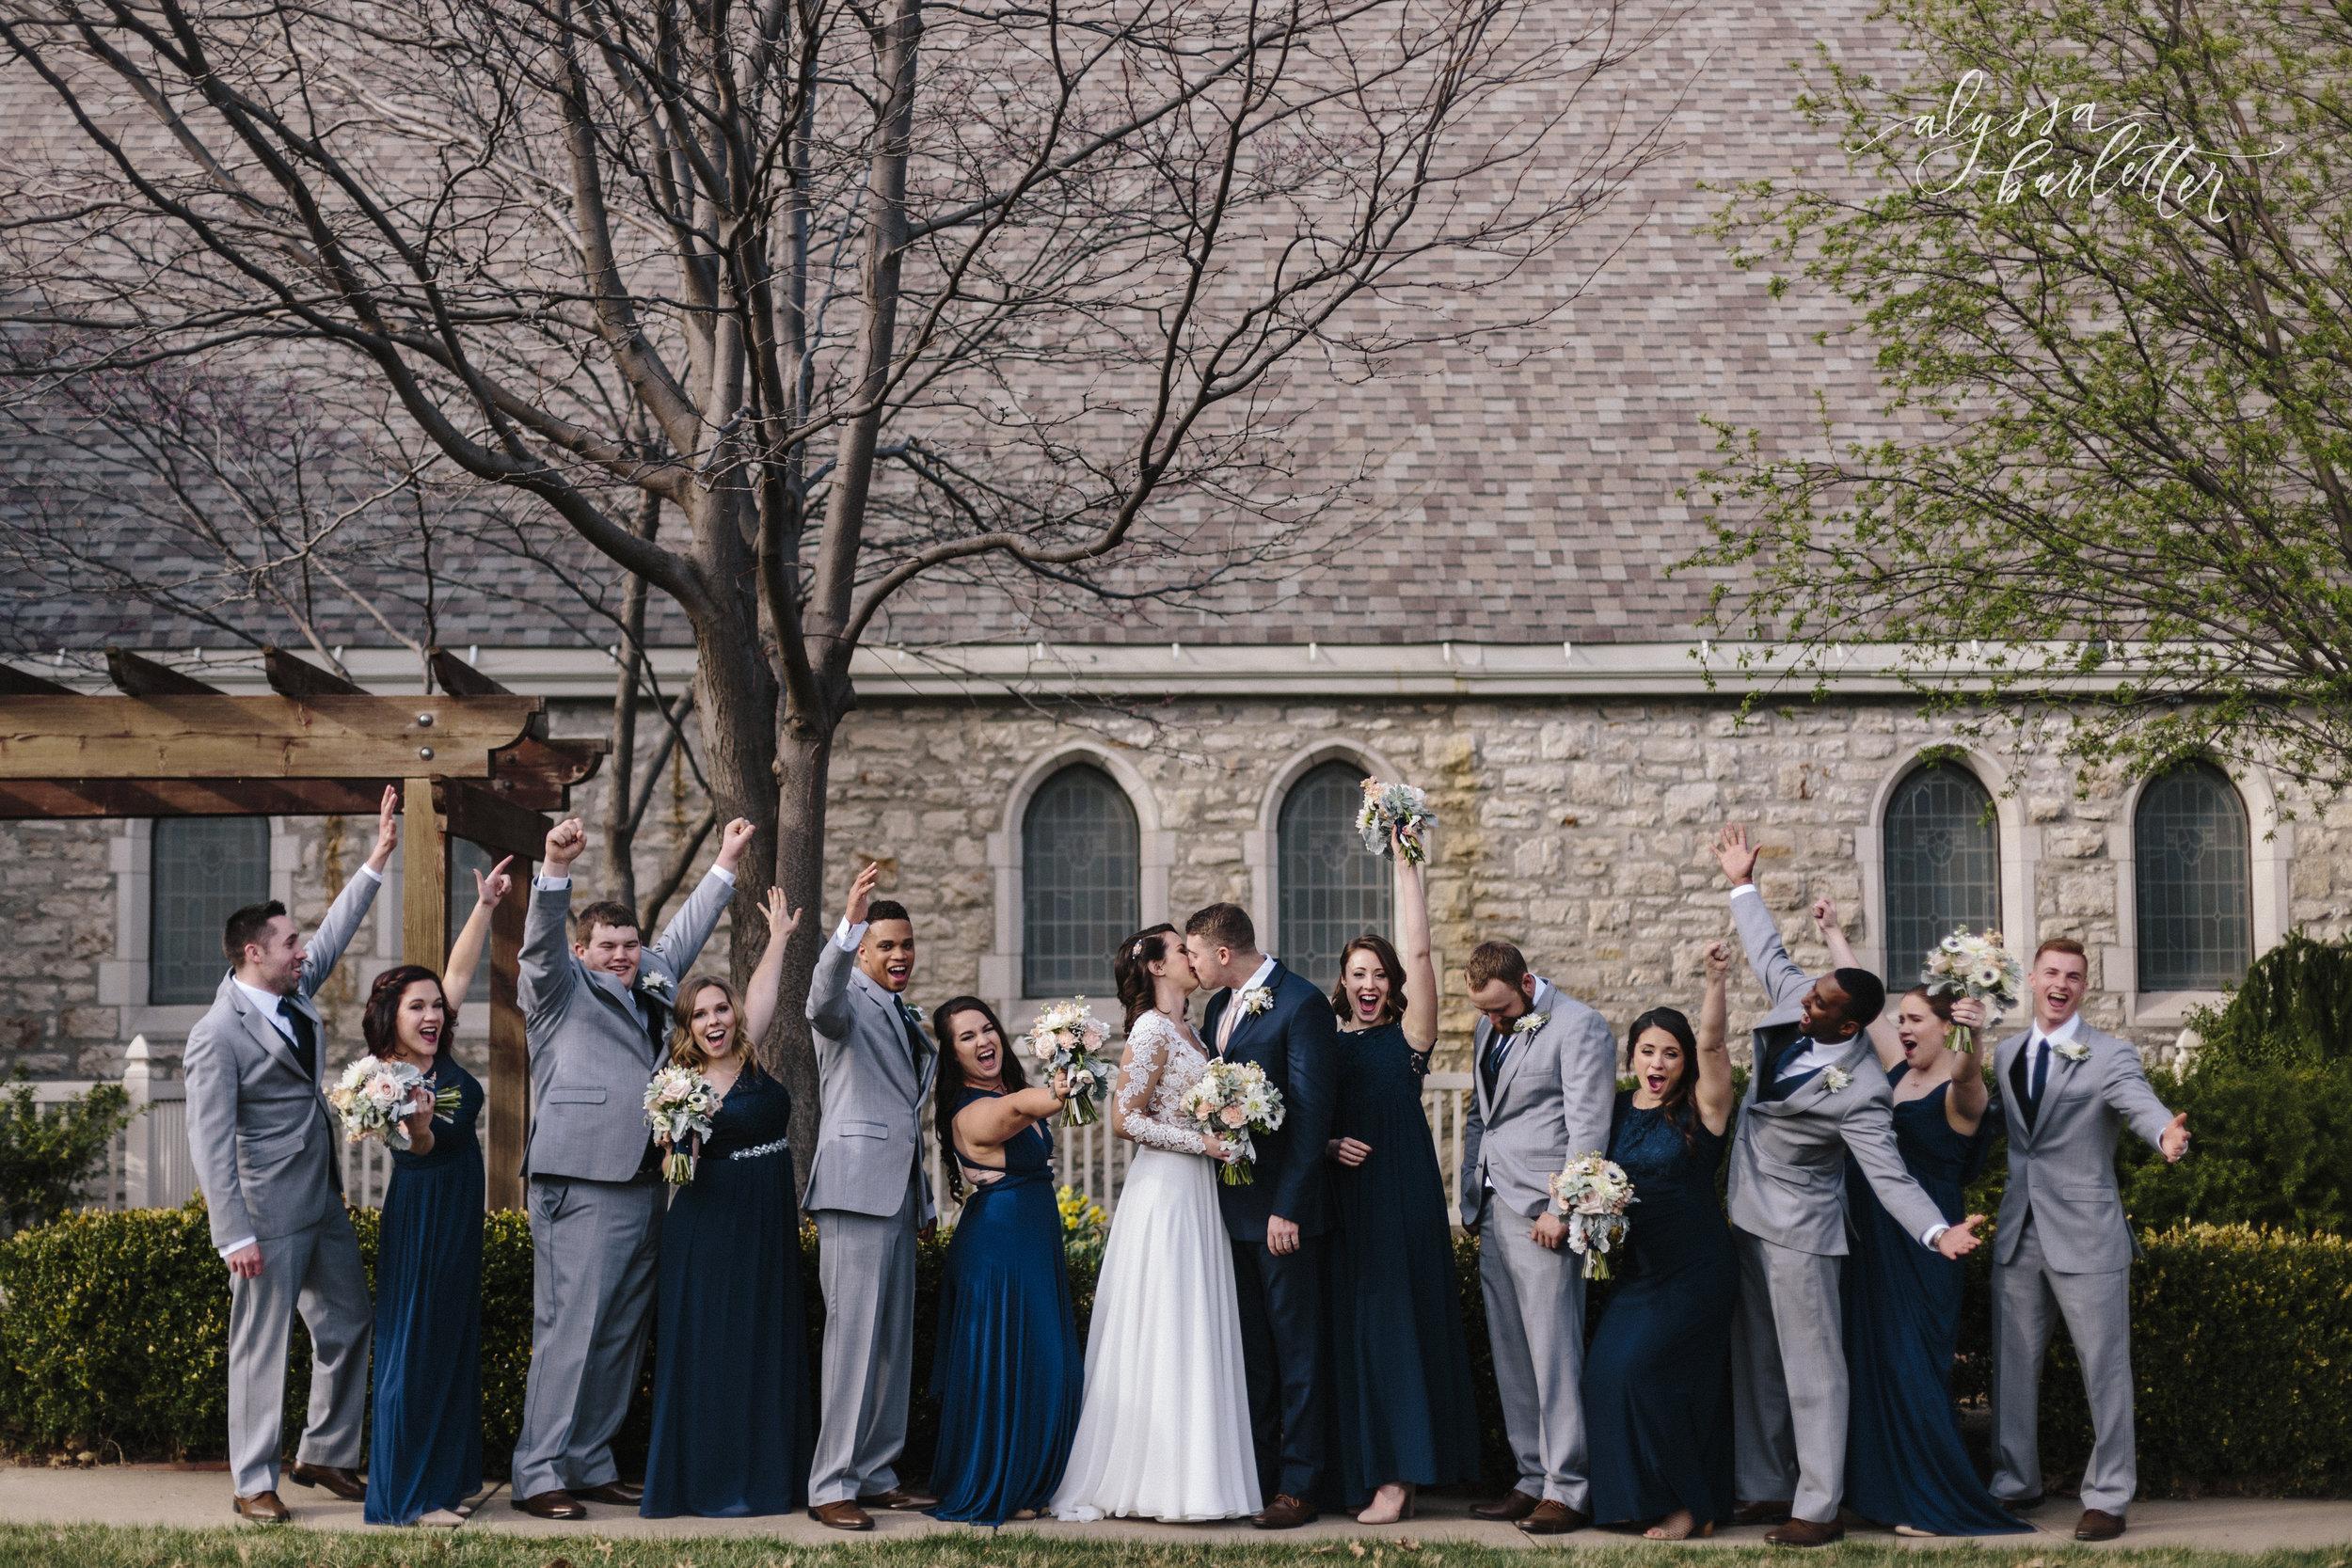 alyssa barletter photography kansas city spring wedding 28 event space courtney and zach-1-23.jpg